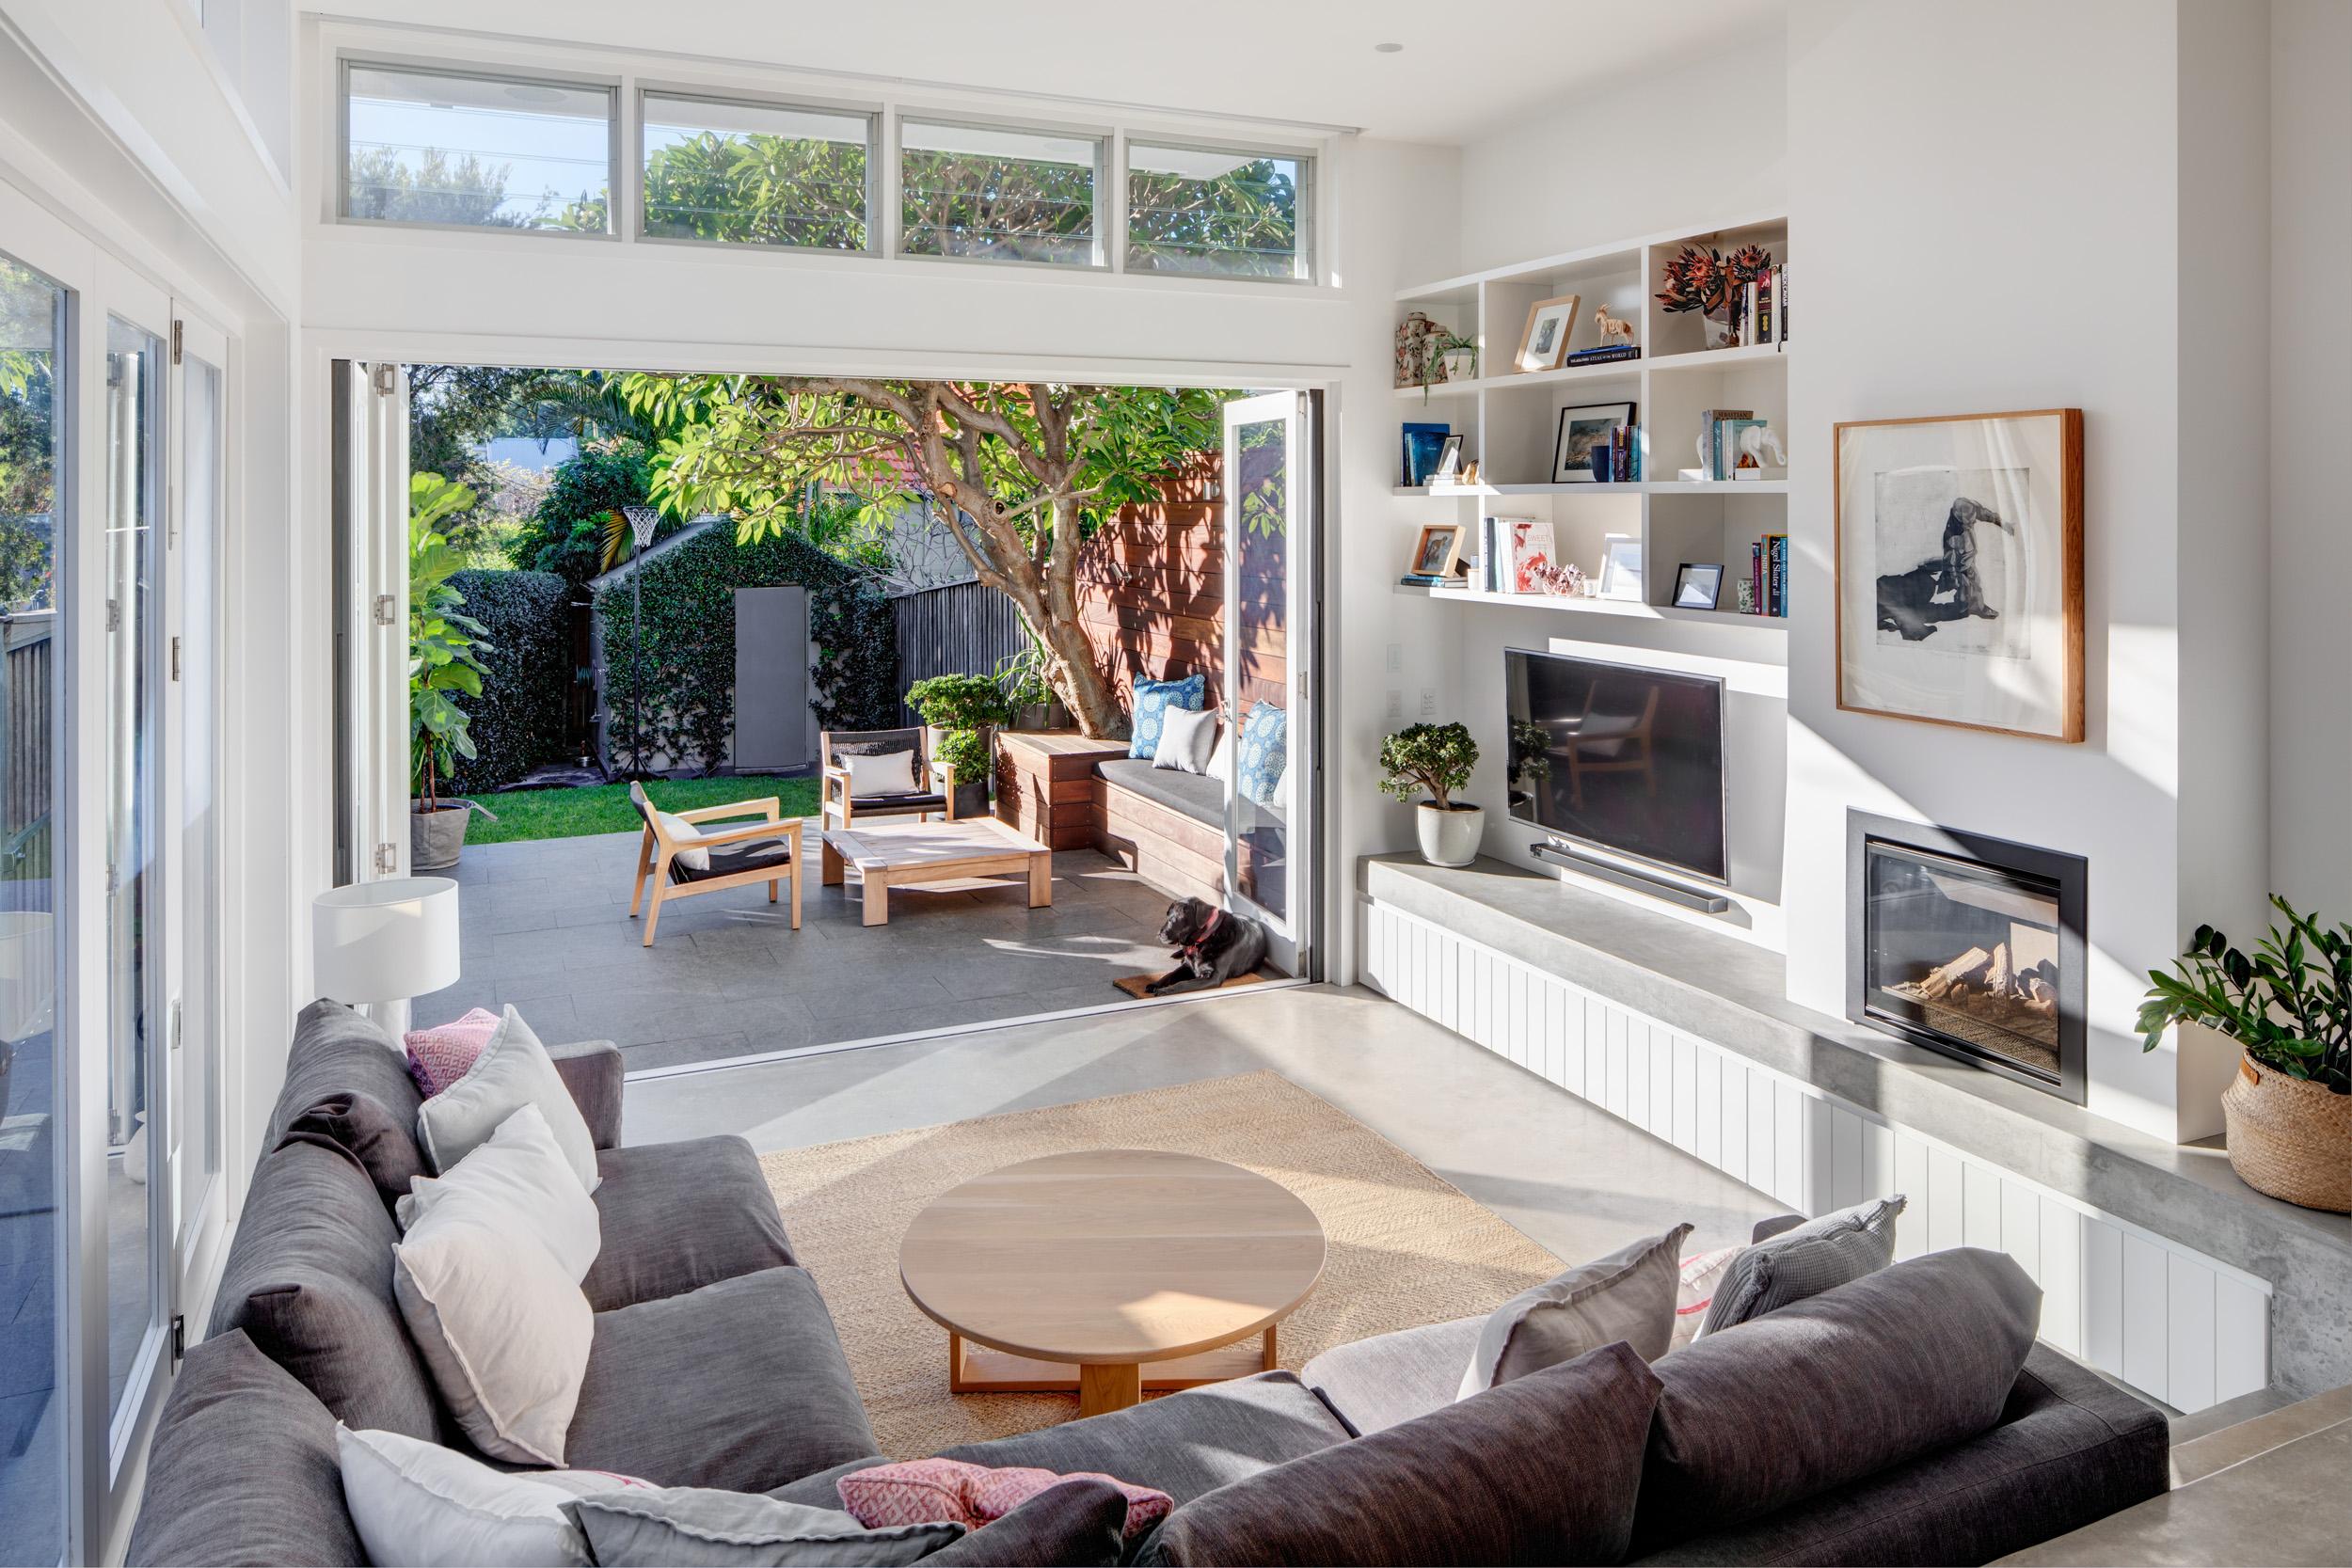 Jem_Cresswell_Architecture_Residential_Photographer_Sydney_Australia_014.jpg